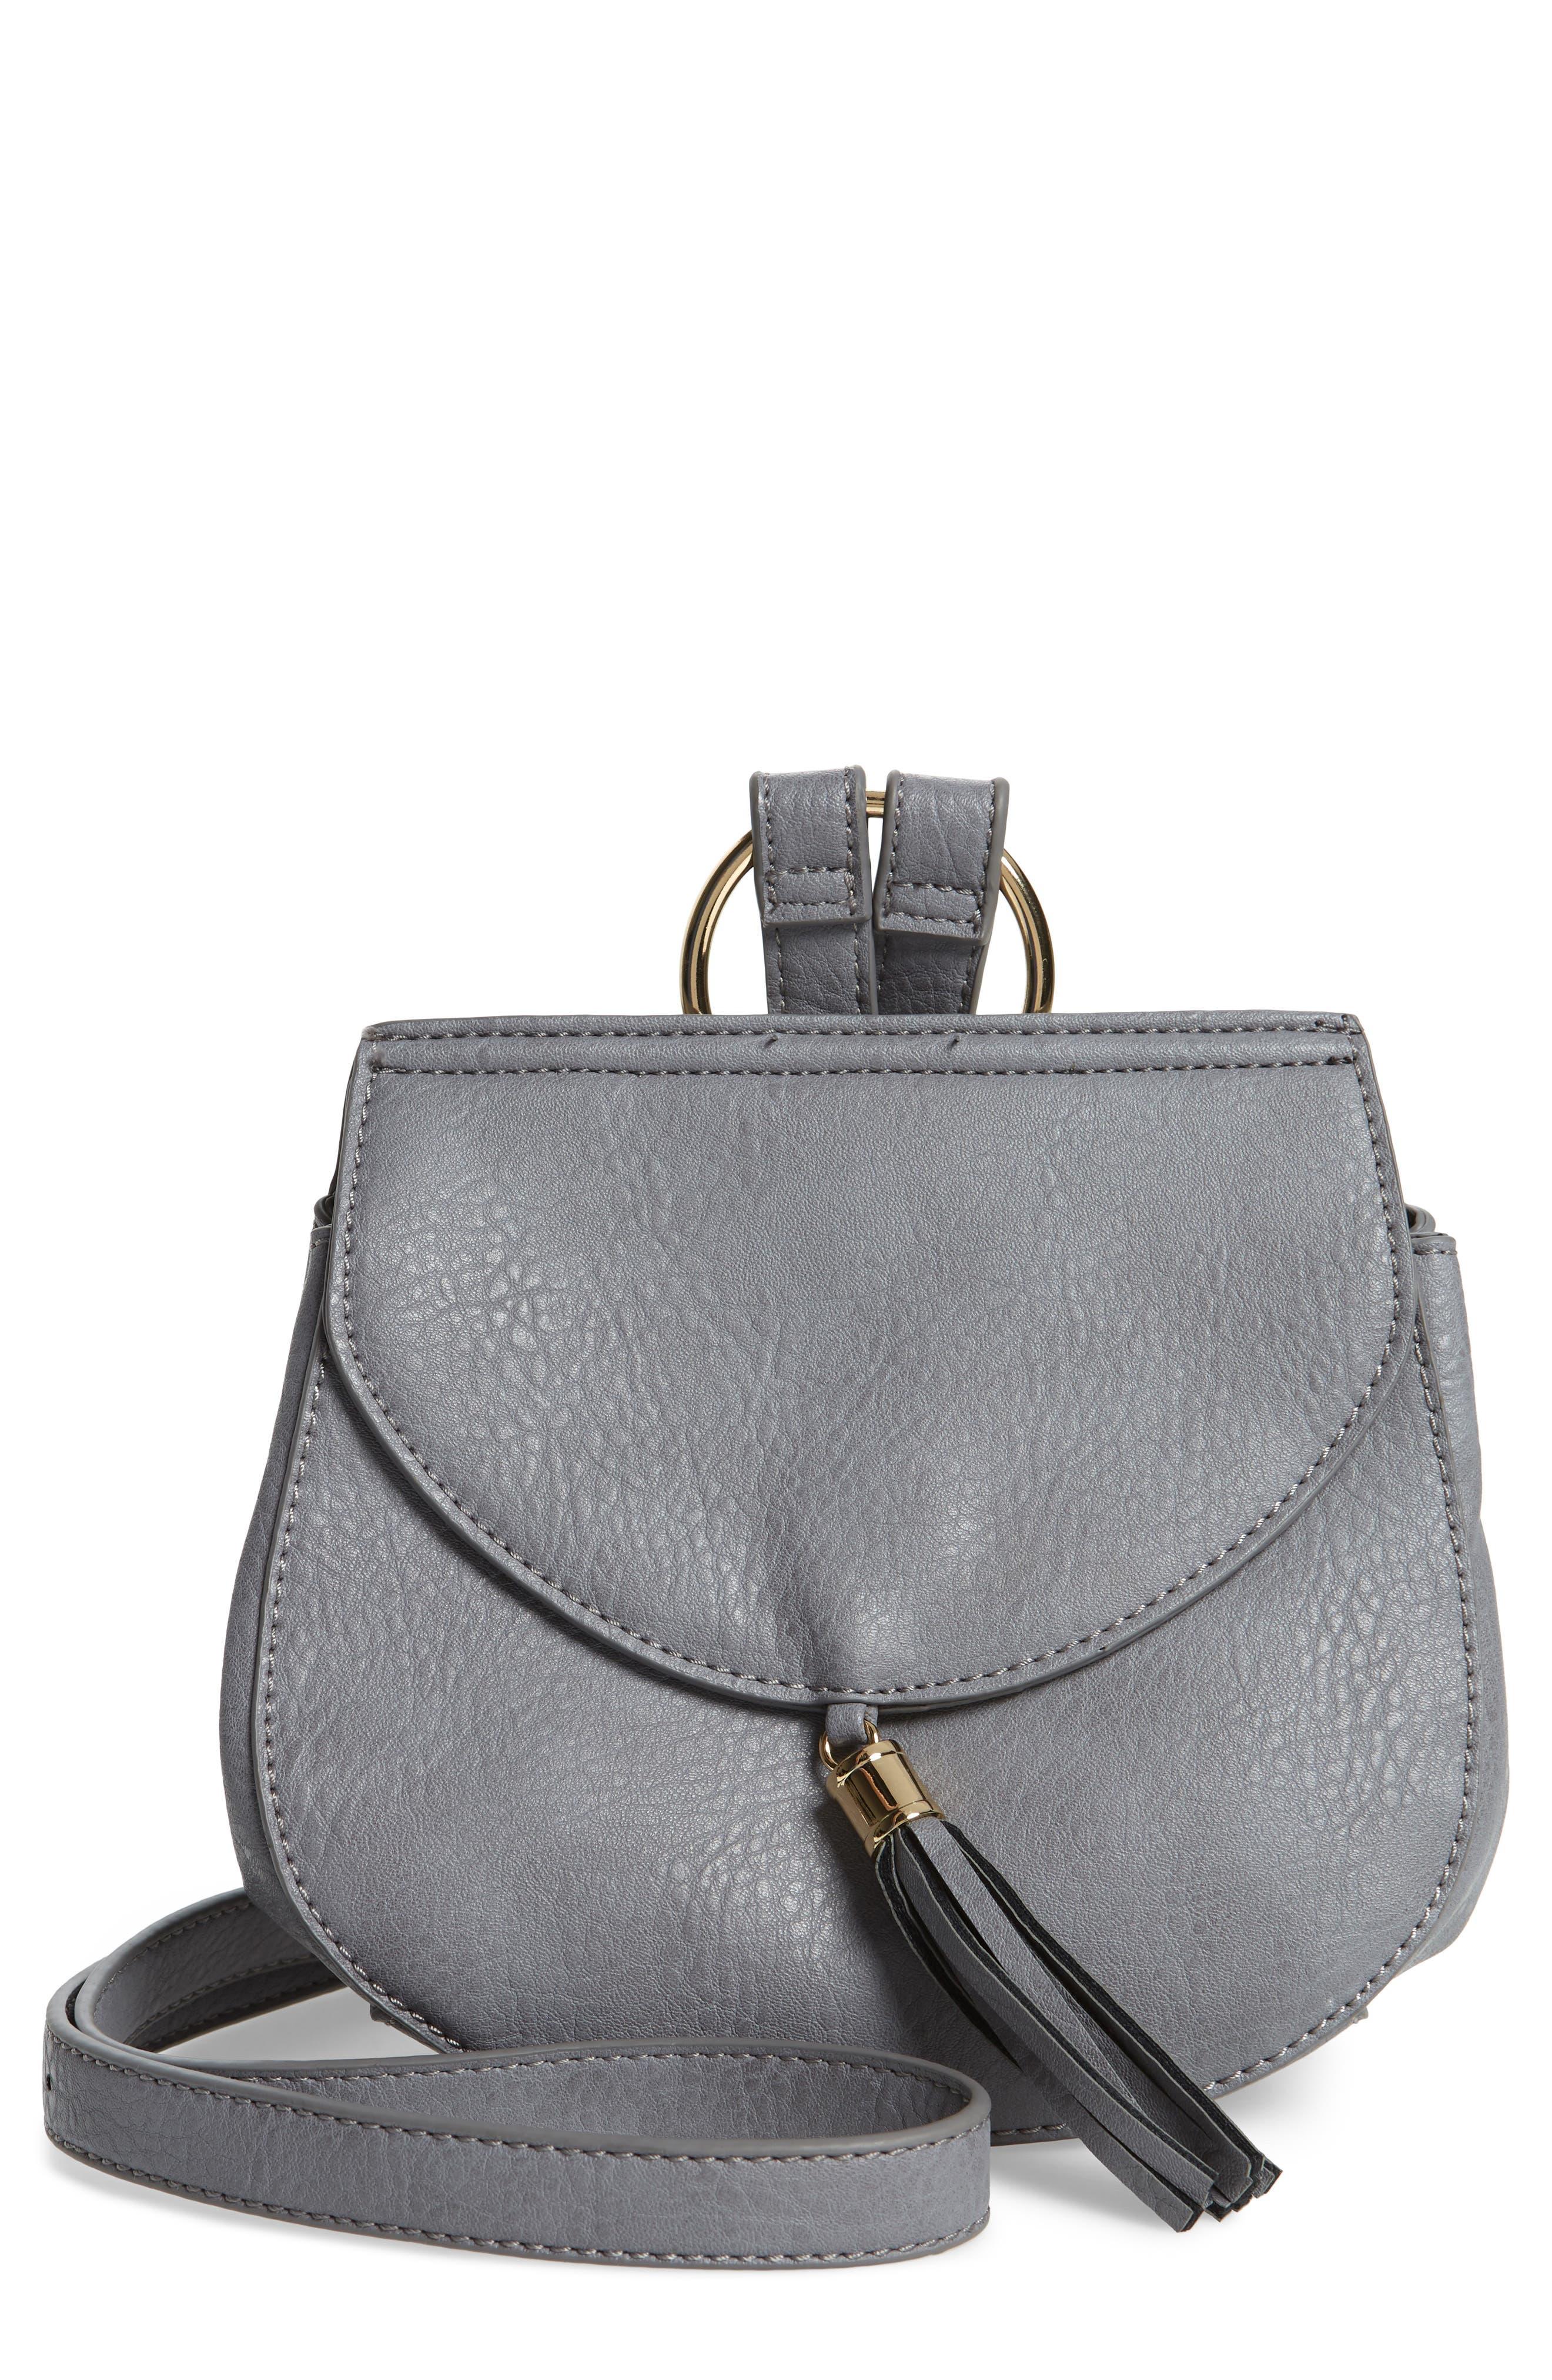 Tassel Faux Leather Crossbody Saddle Bag,                             Main thumbnail 1, color,                             Grey